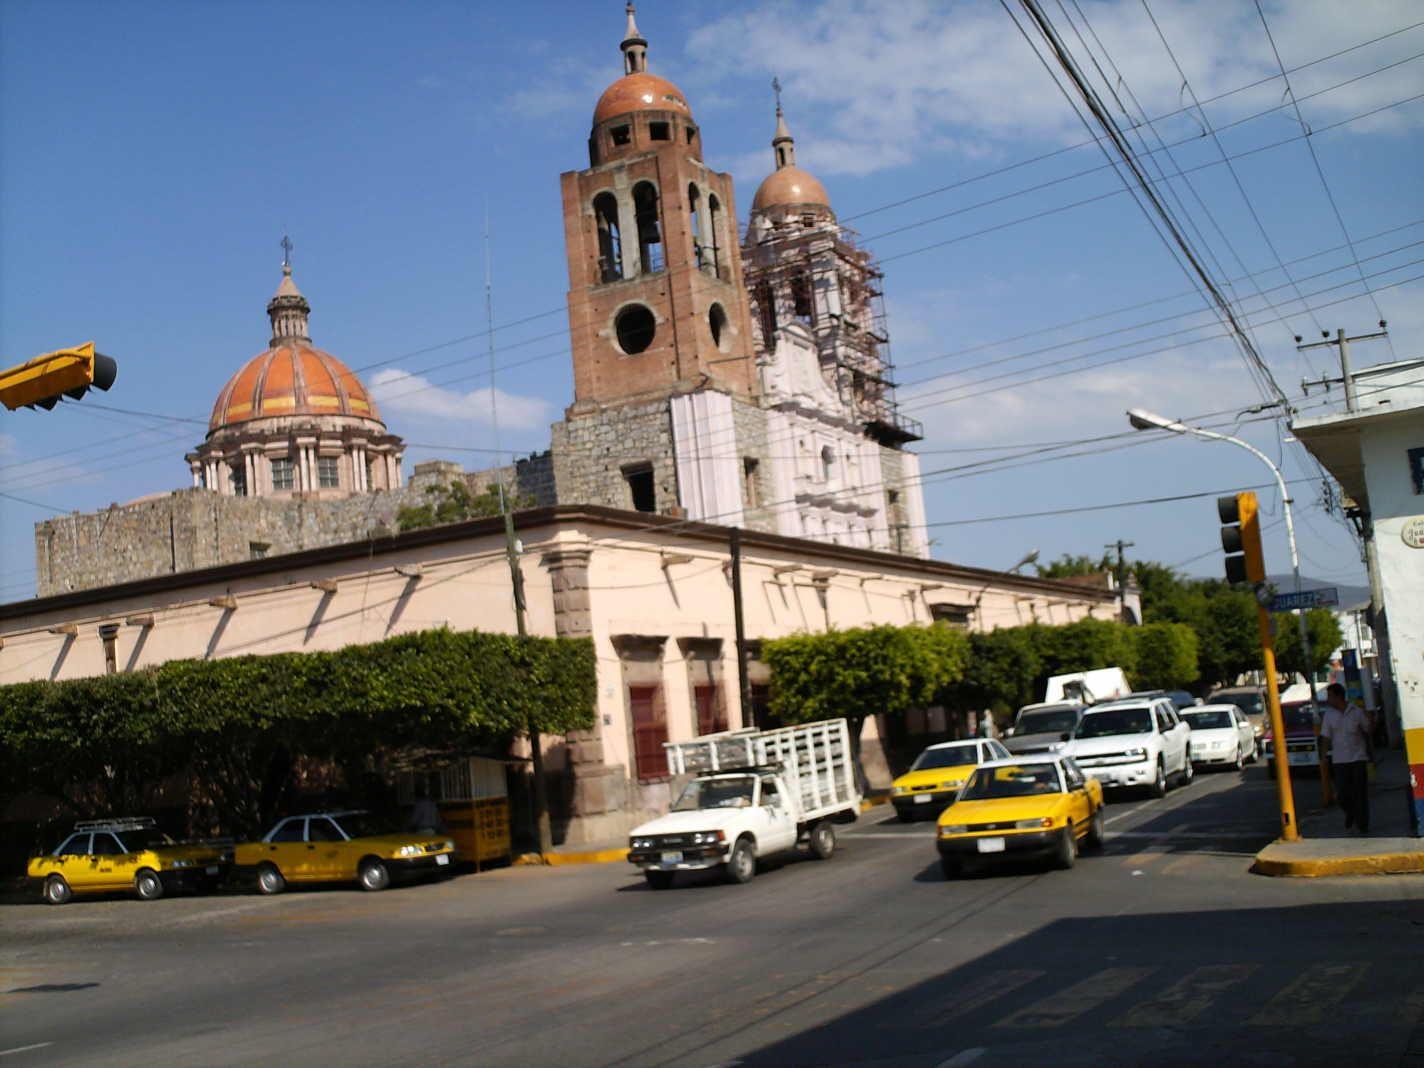 Autlan Jalisco México